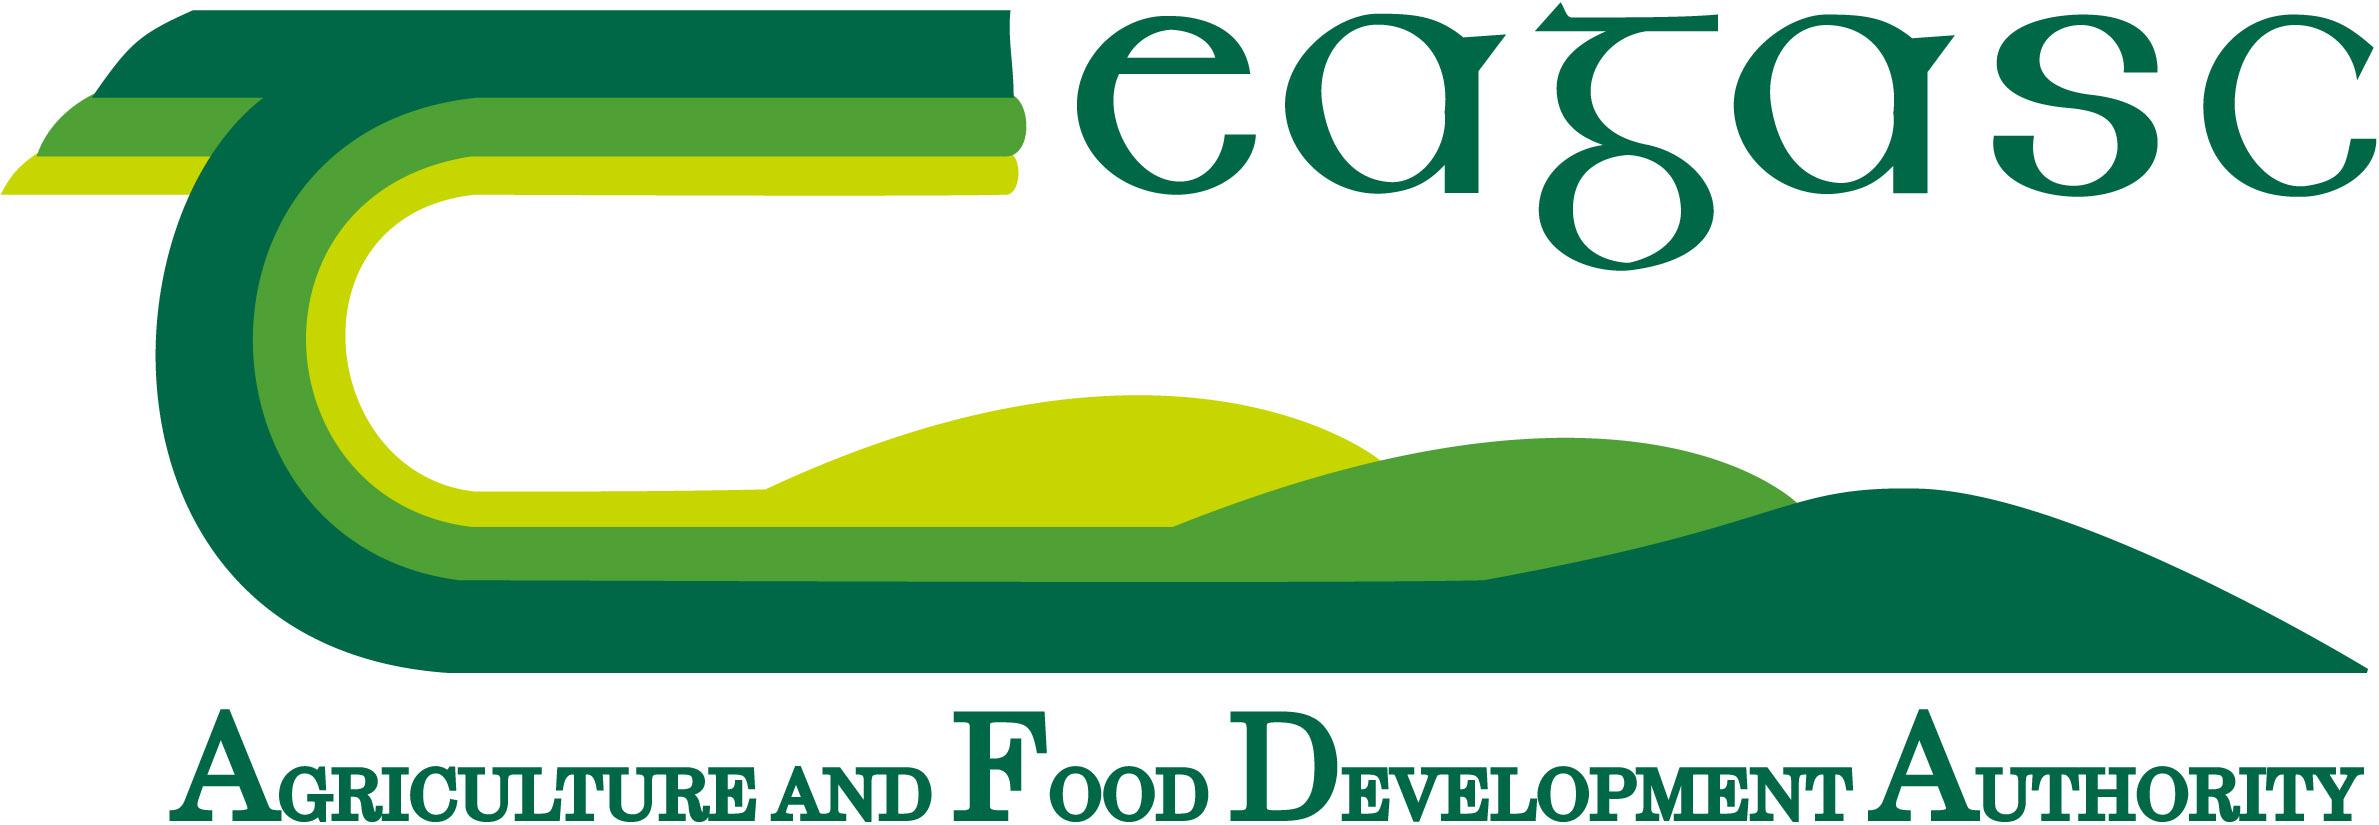 teagasc-logo